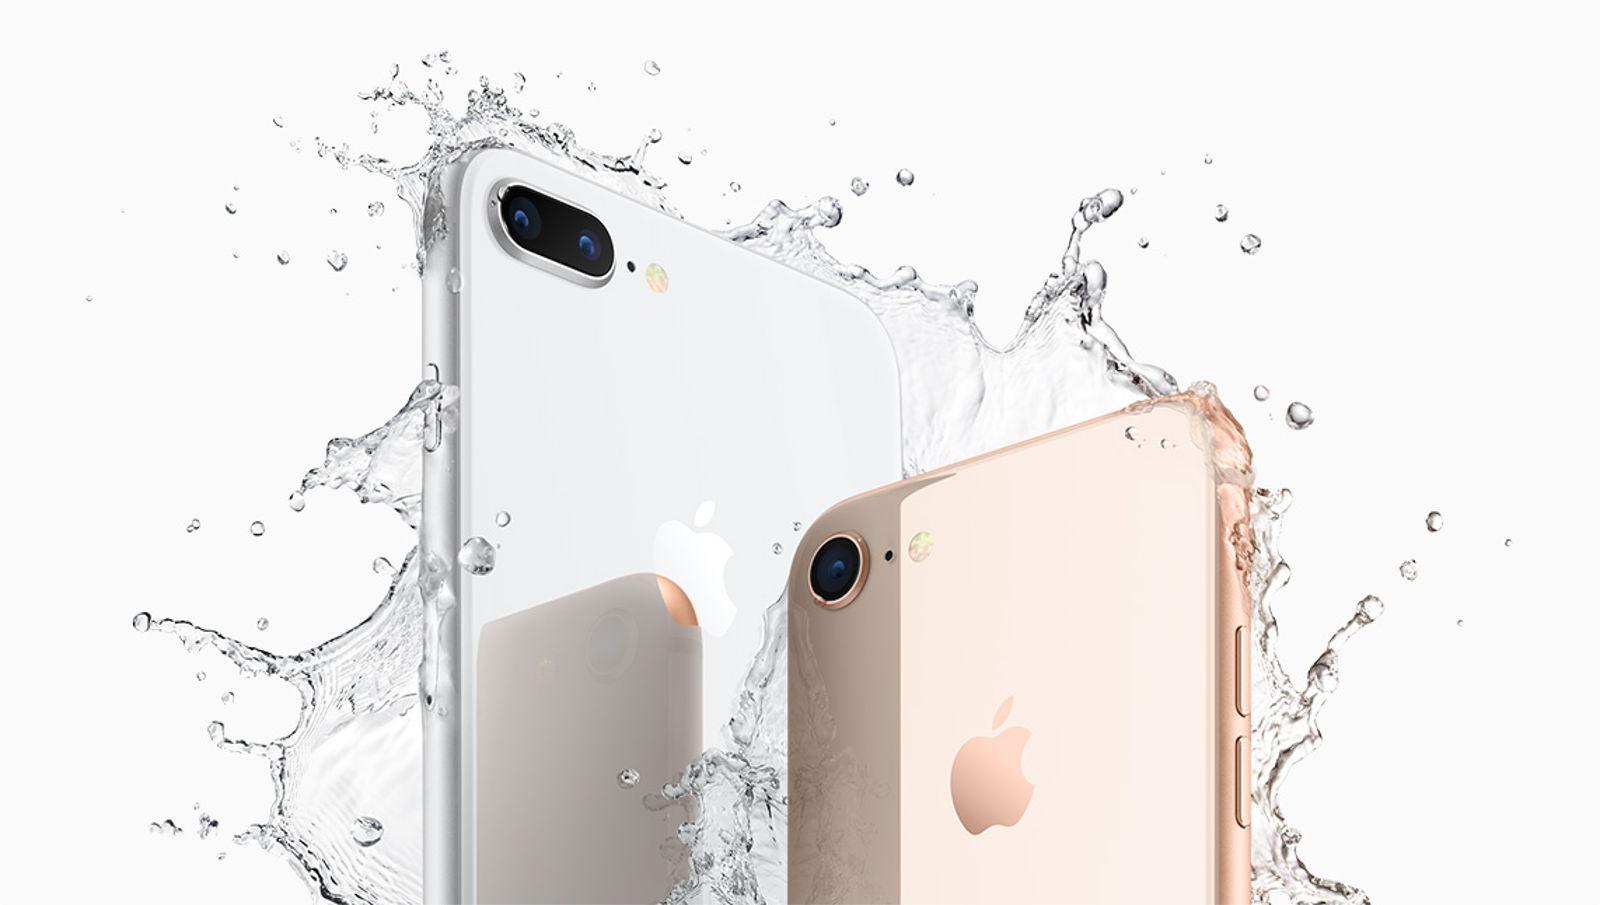 Das iPhone 8 kann nun Wireless Charging